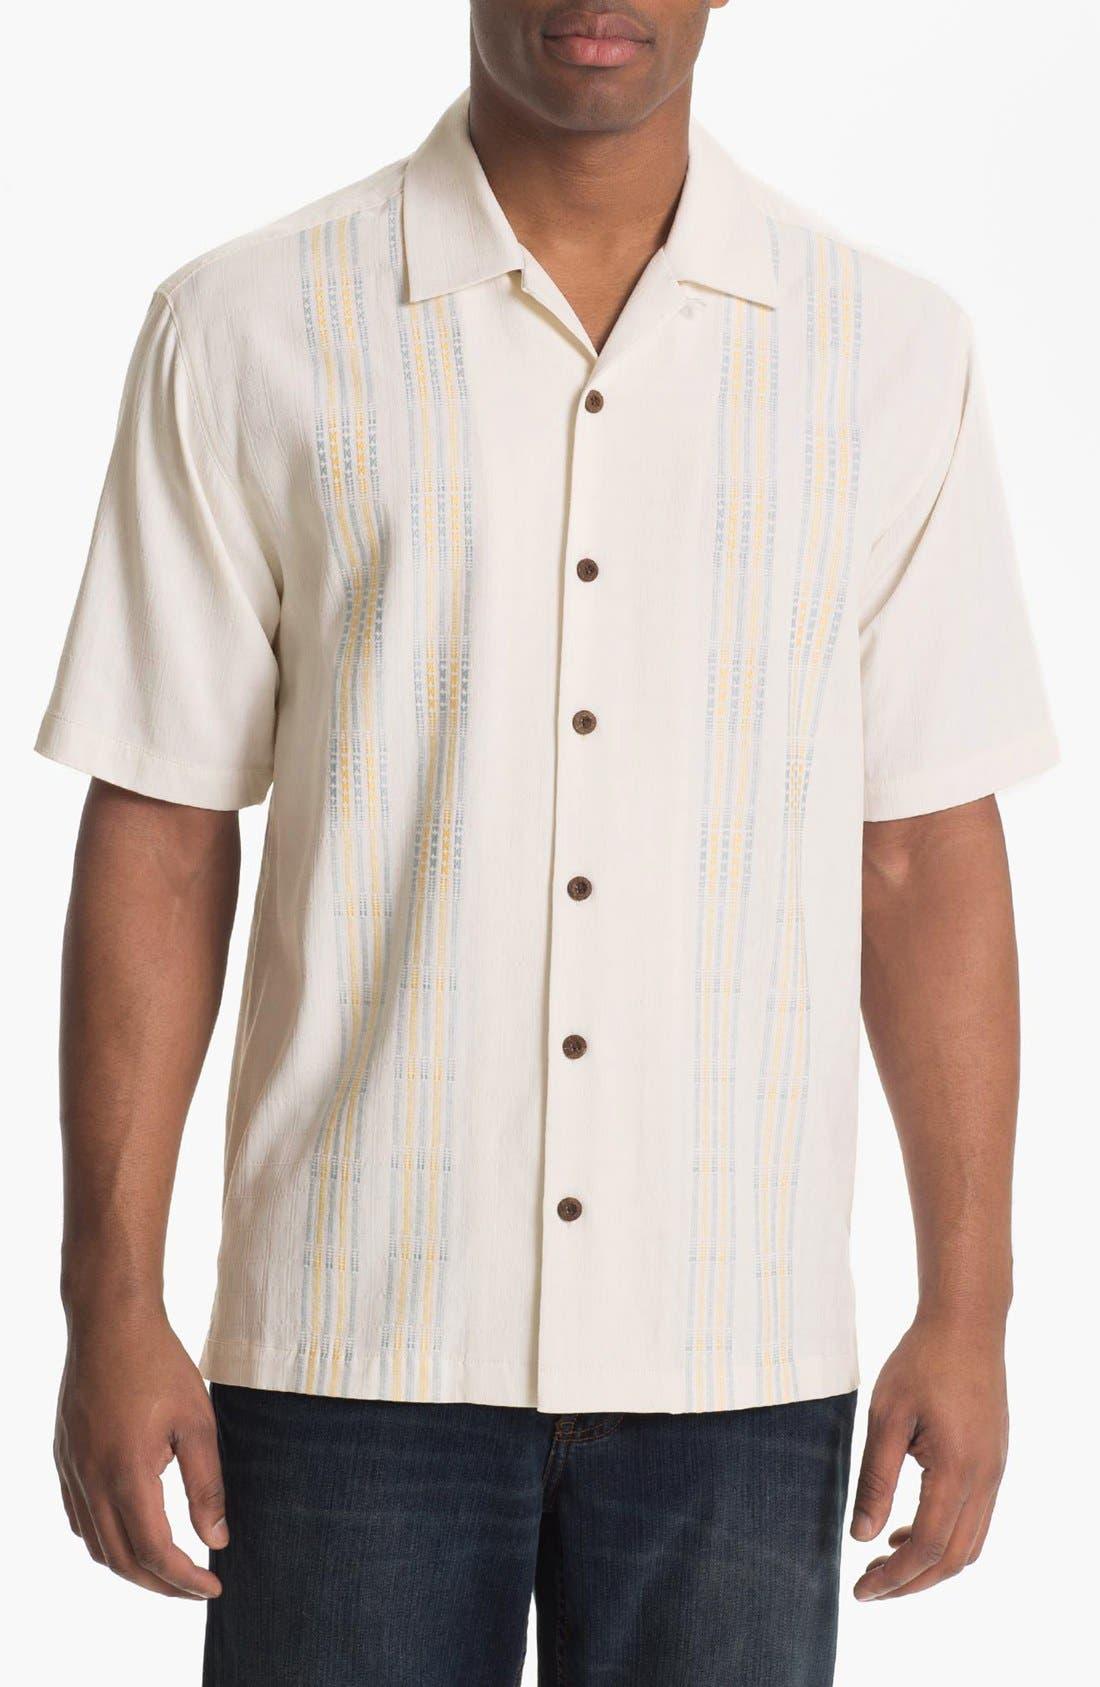 Main Image - Tommy Bahama 'Four Amigos' Silk Campshirt (Big & Tall)